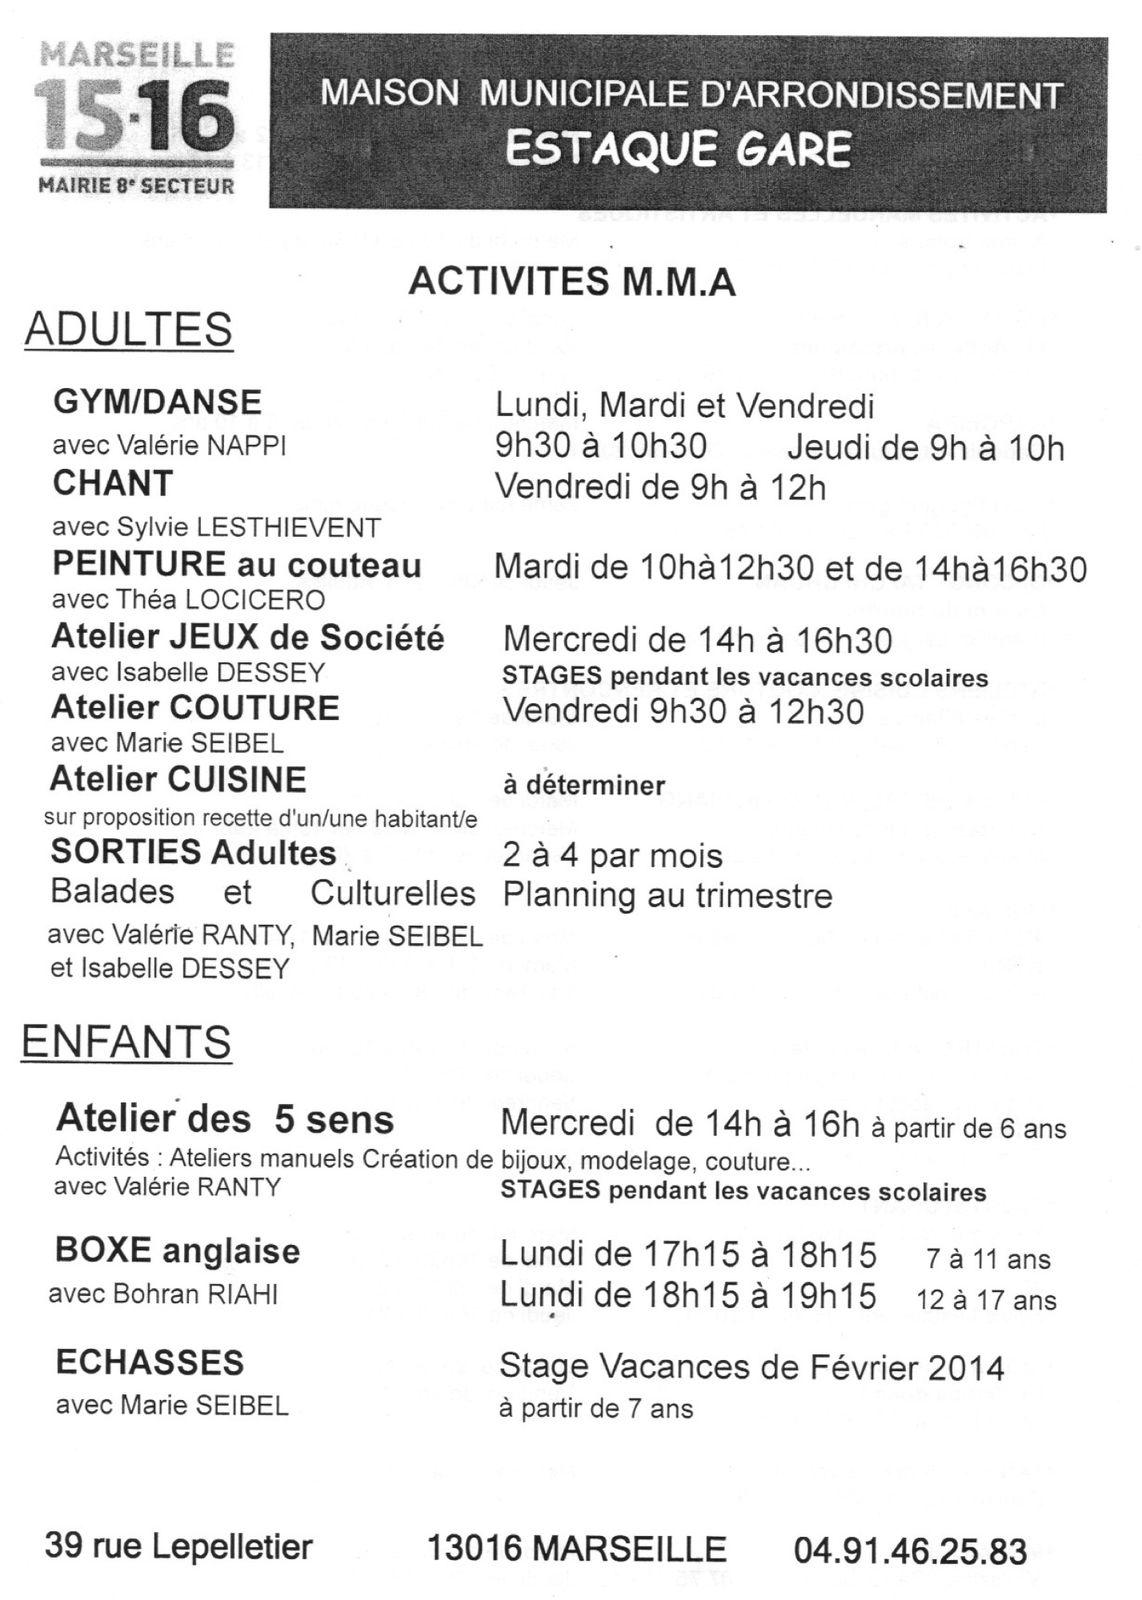 MMA Estaque Gare - Activités 2013